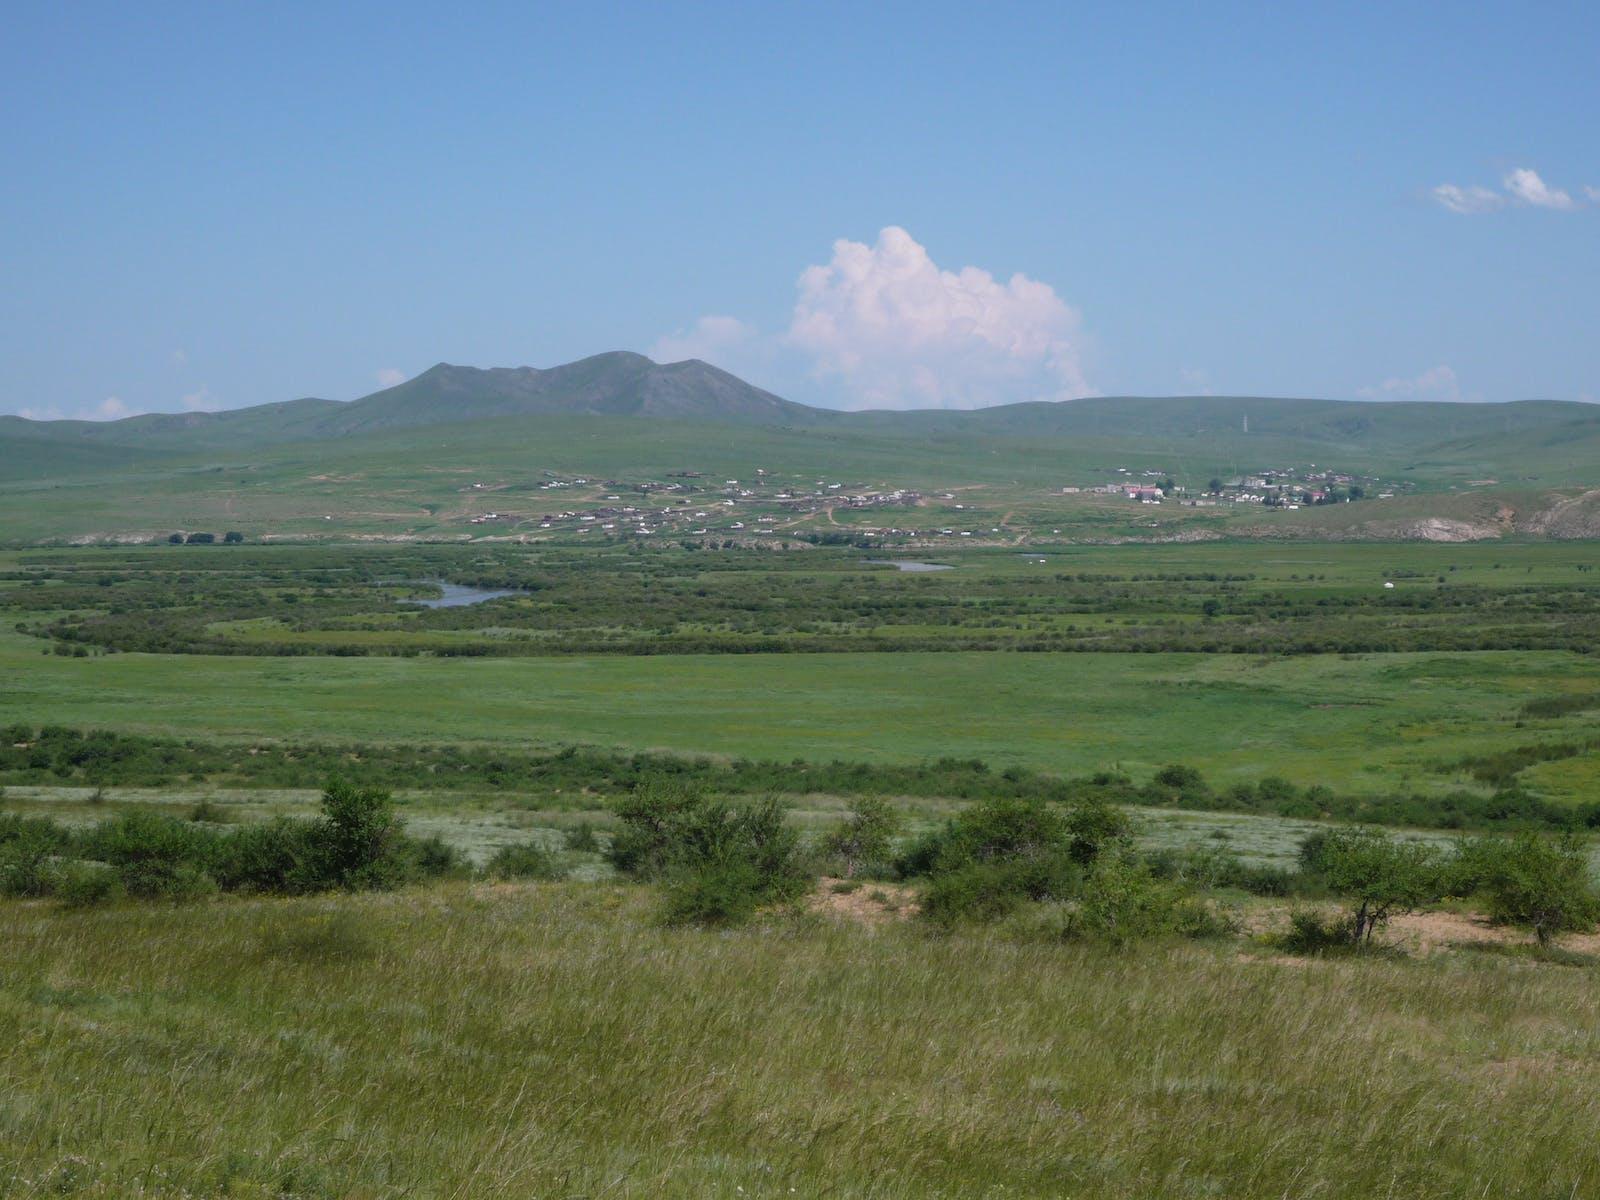 Selenge-Orkhon Forest Steppe